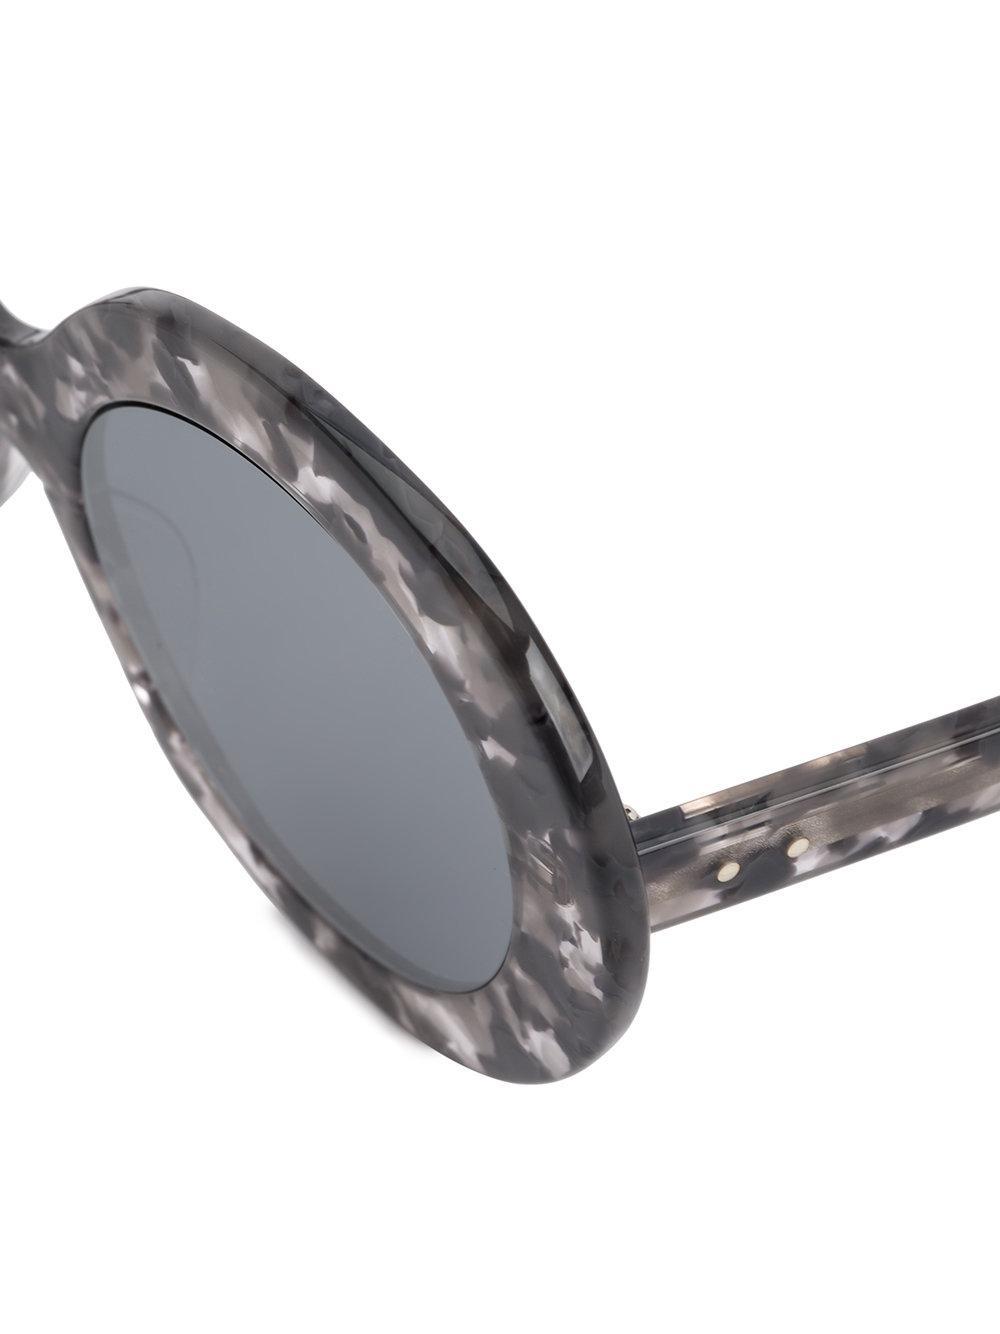 Thom Browne Retro Tortoise Shell Sunglasses in Grey (Grey)